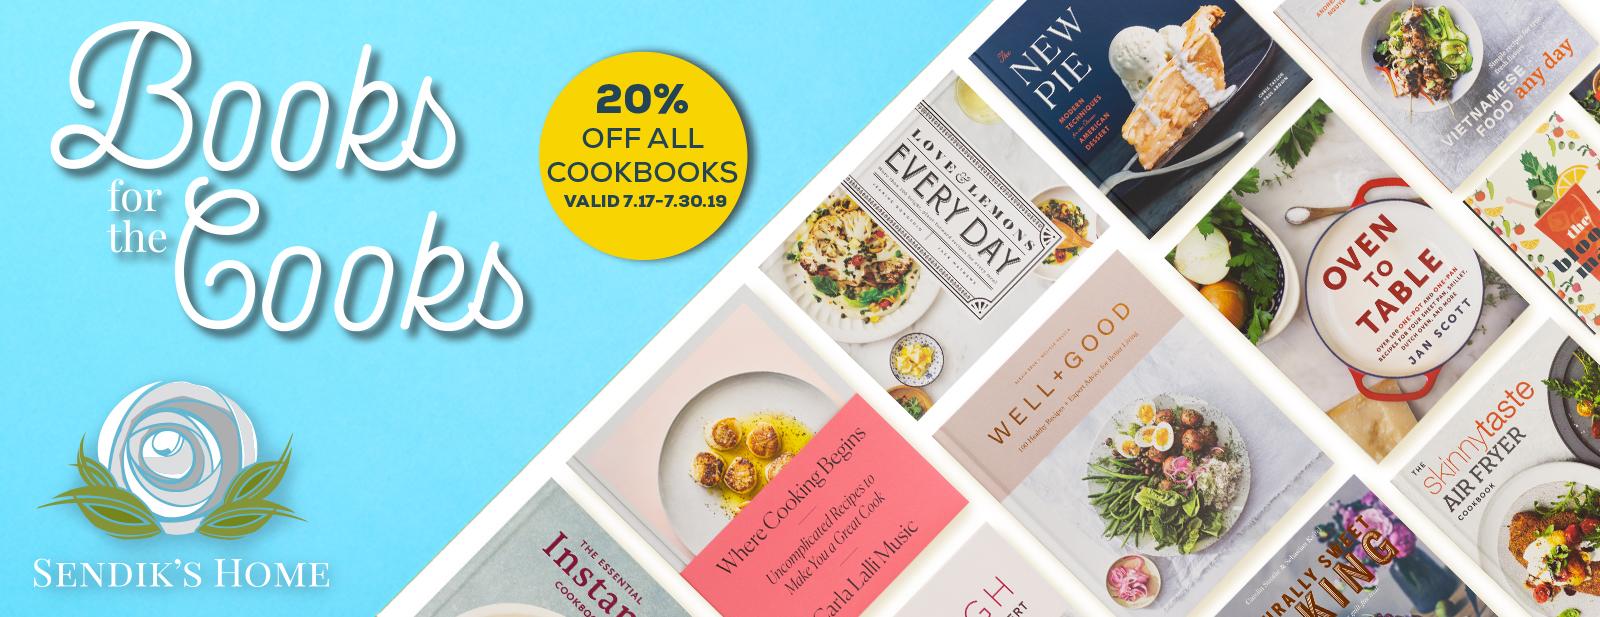 20% Off All Cookbooks